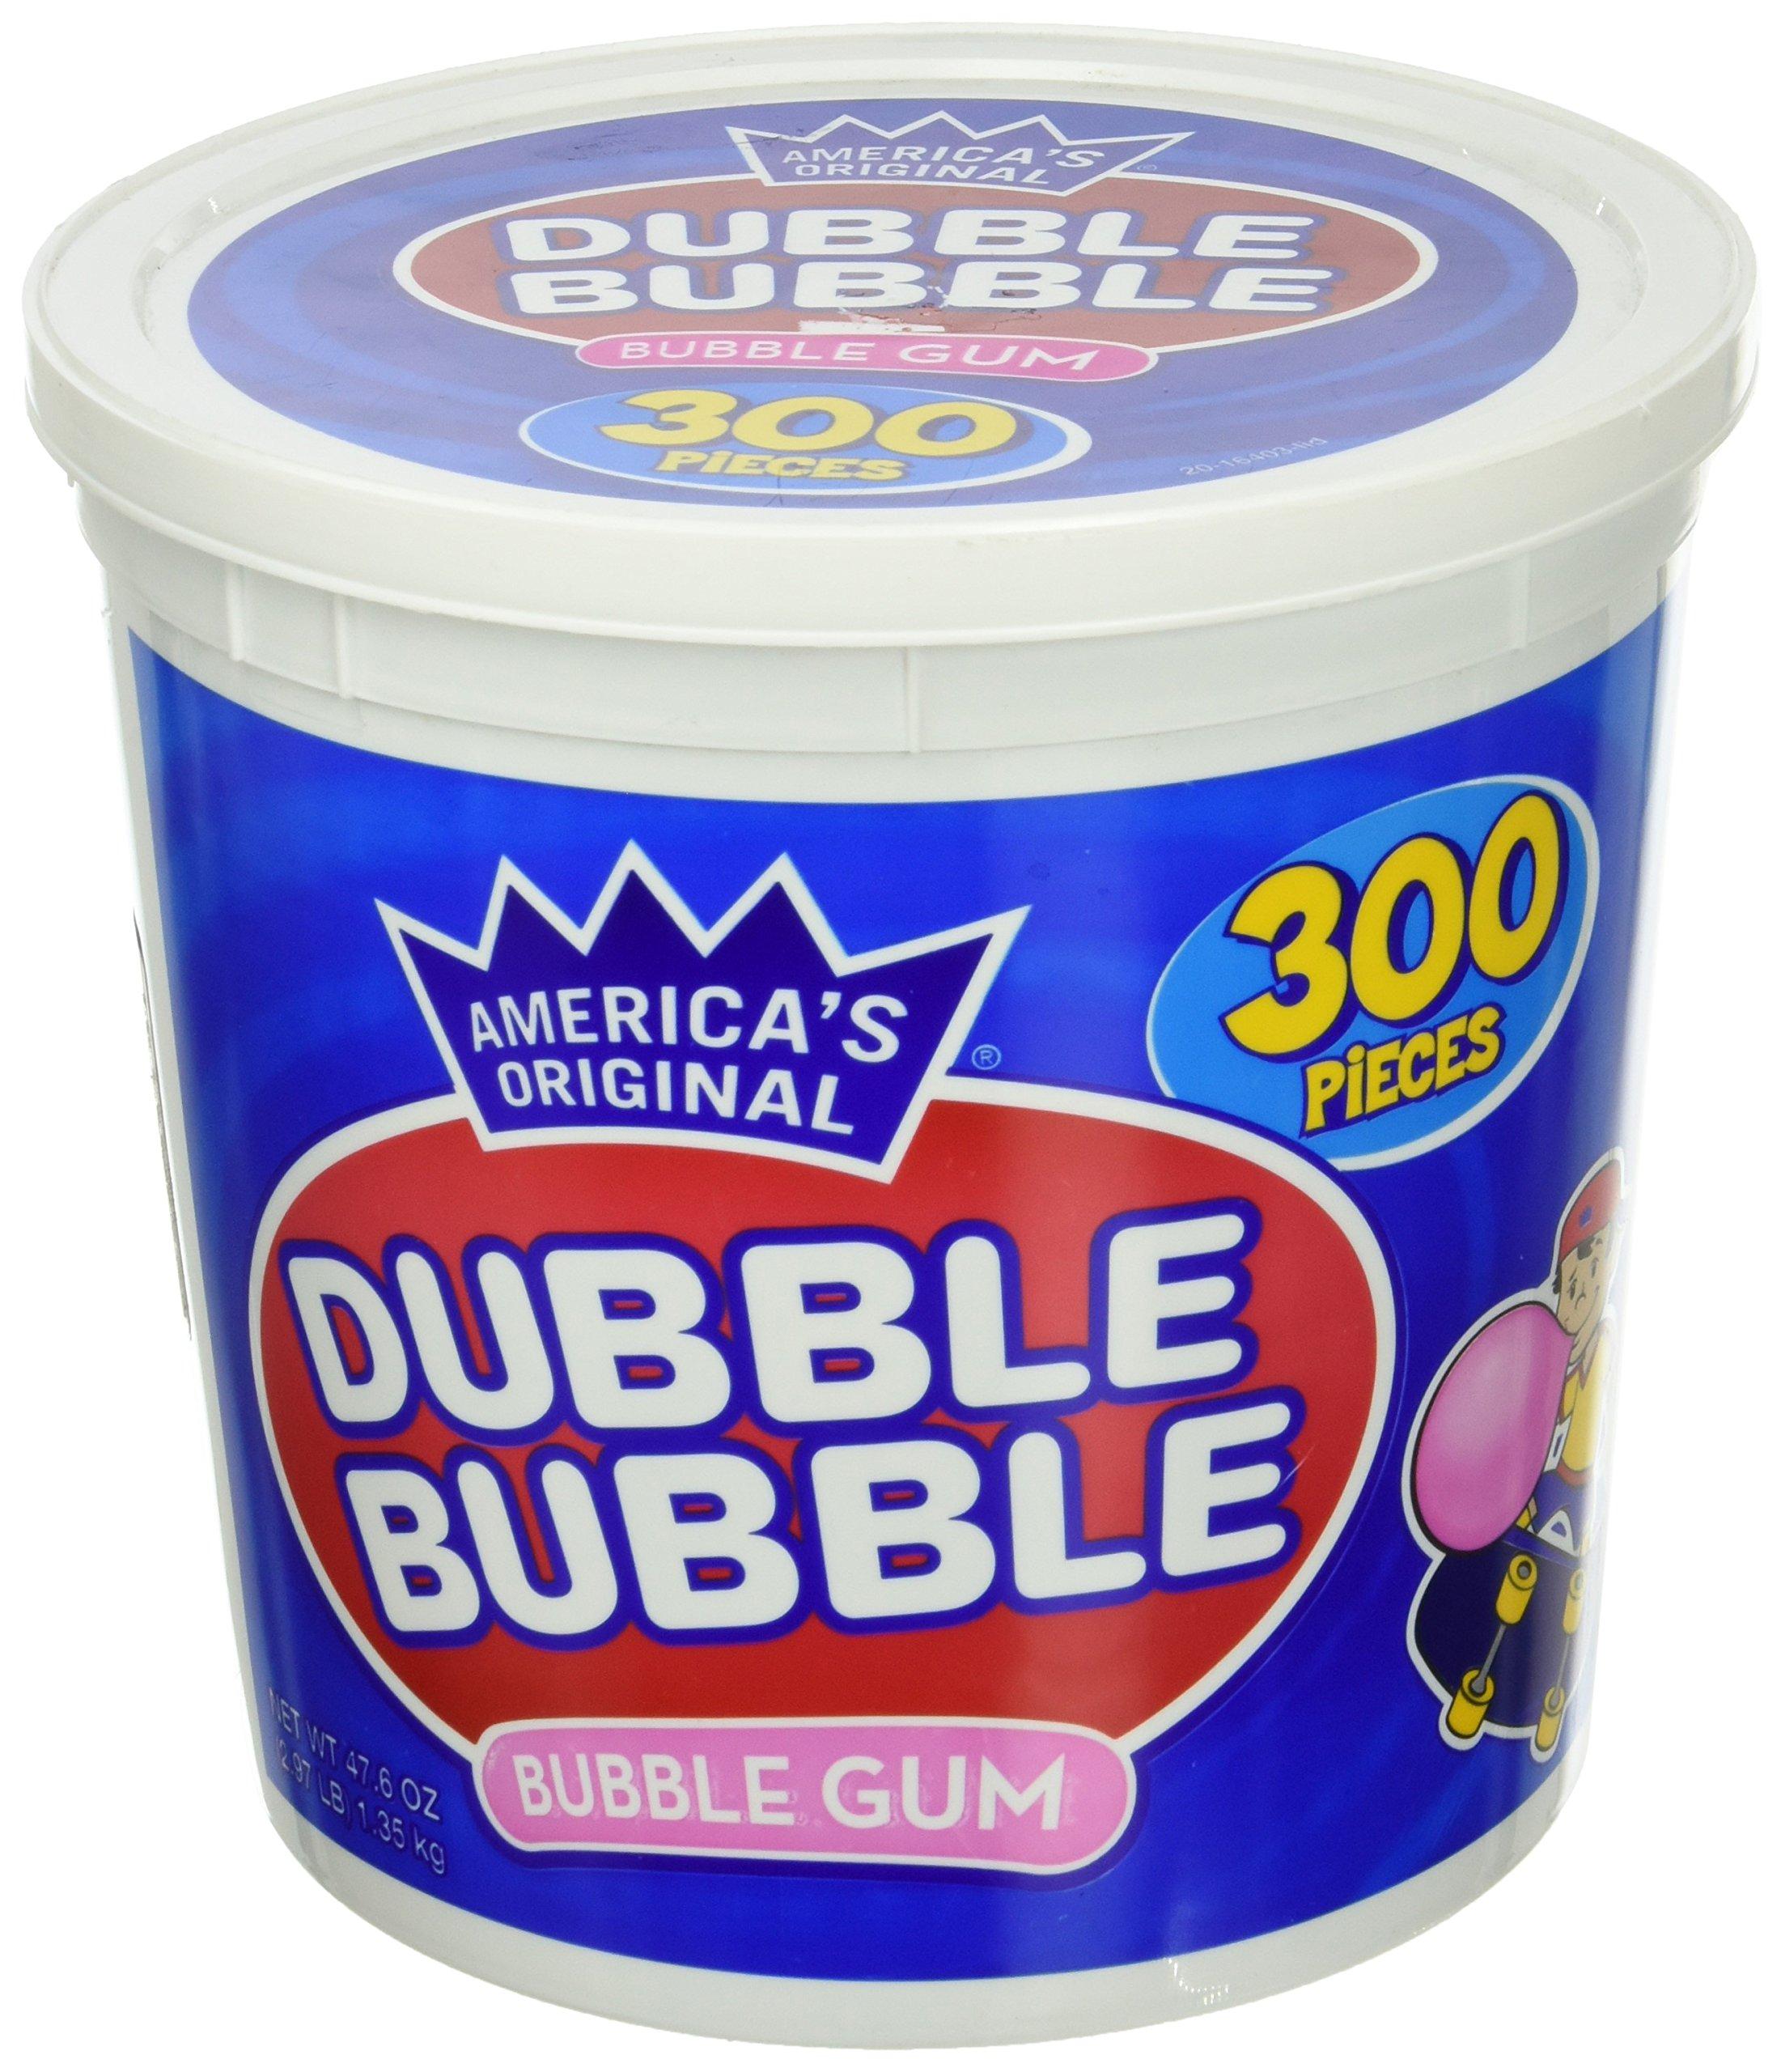 America's Original Dubble Bubble Bubble Gum 47.6 Ounce Value Tub 300 Individually Wrapped Pieces